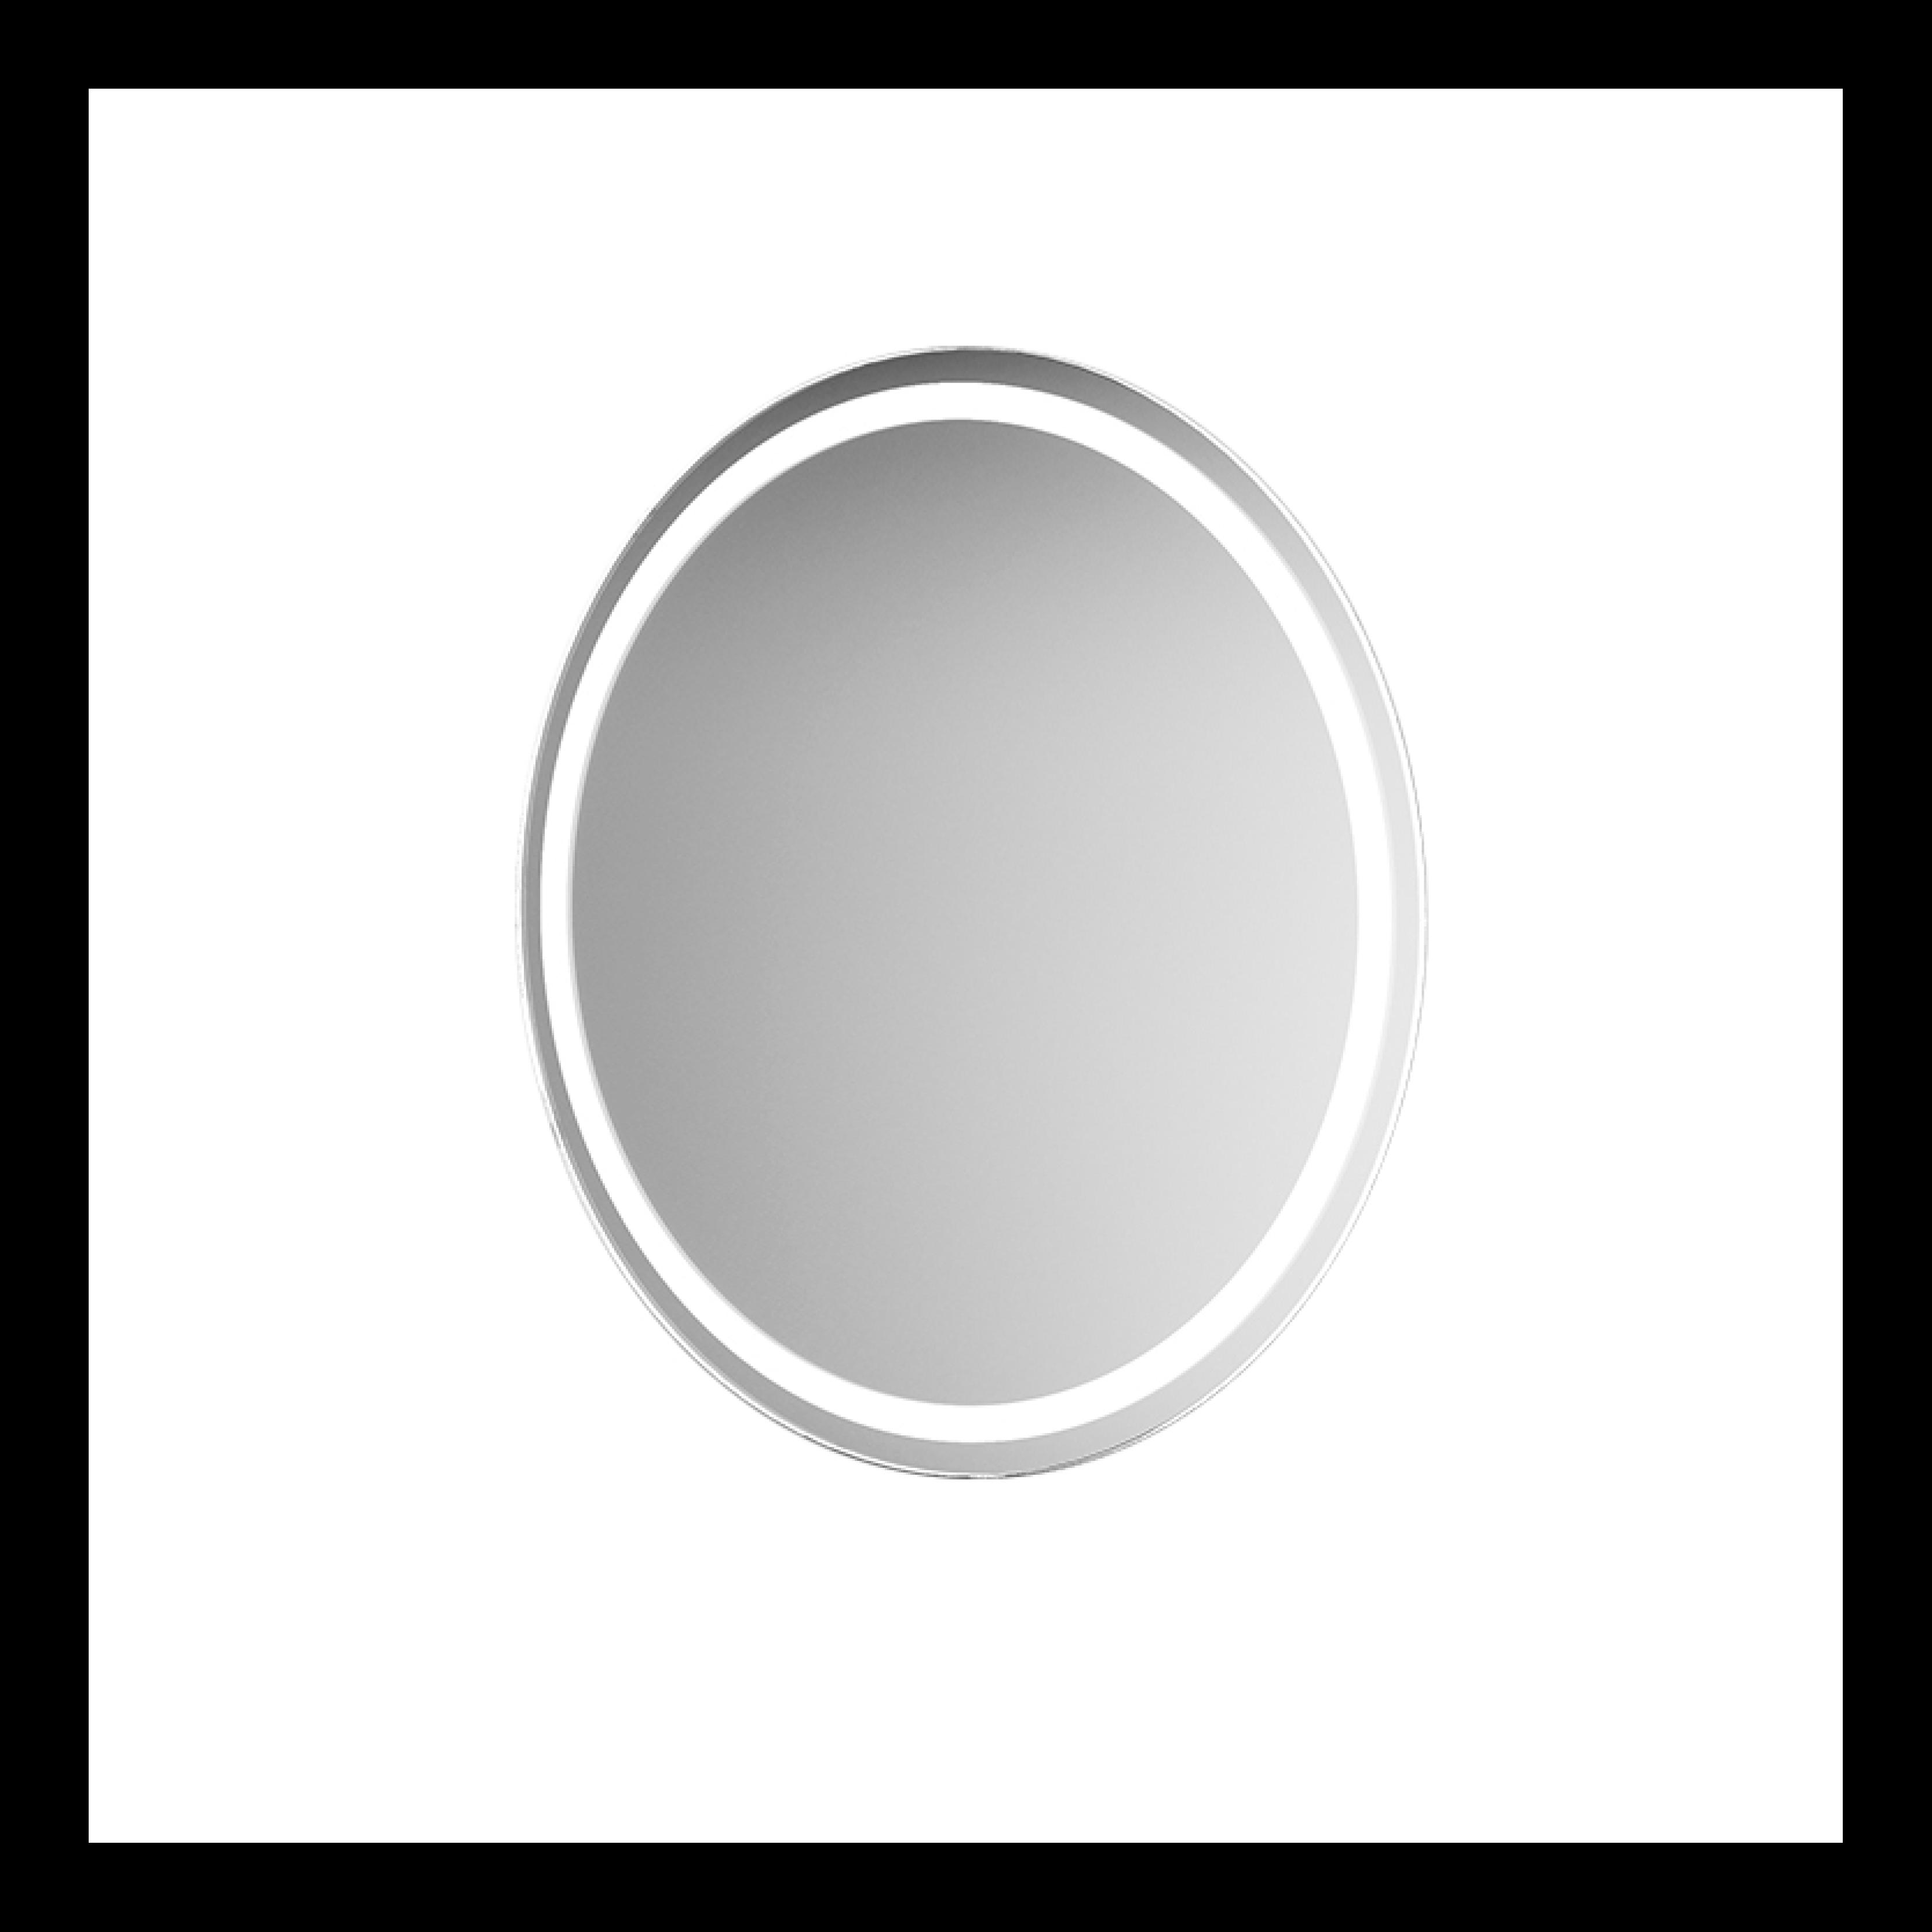 Oglinda cu LED Aurora, Ø80 cm, AZ51061 poza